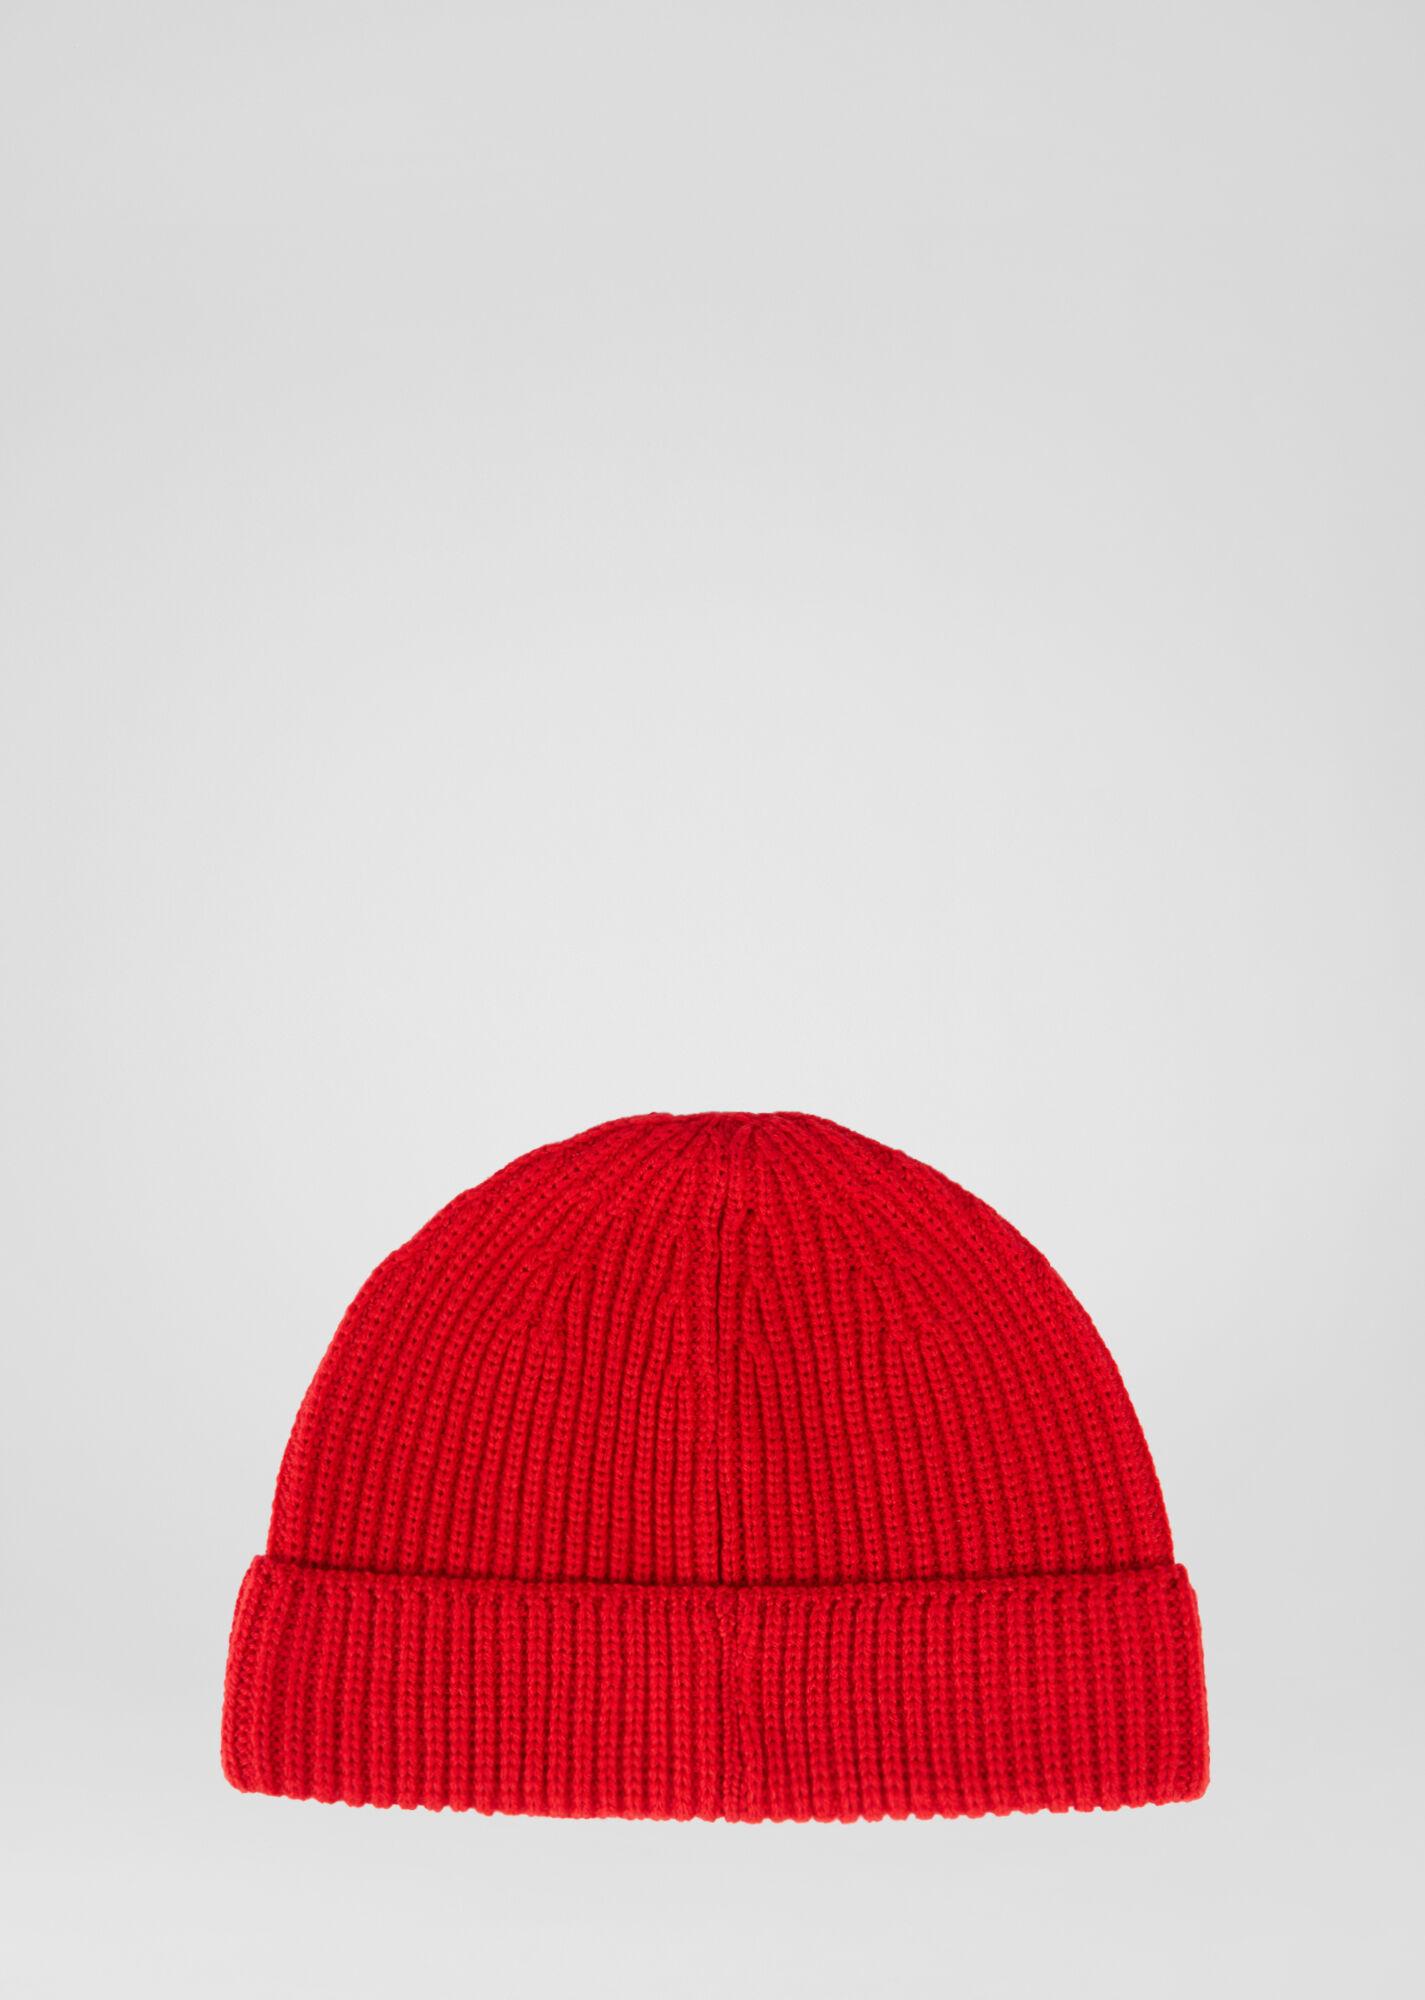 Contrast Color Versace Logo Hat.